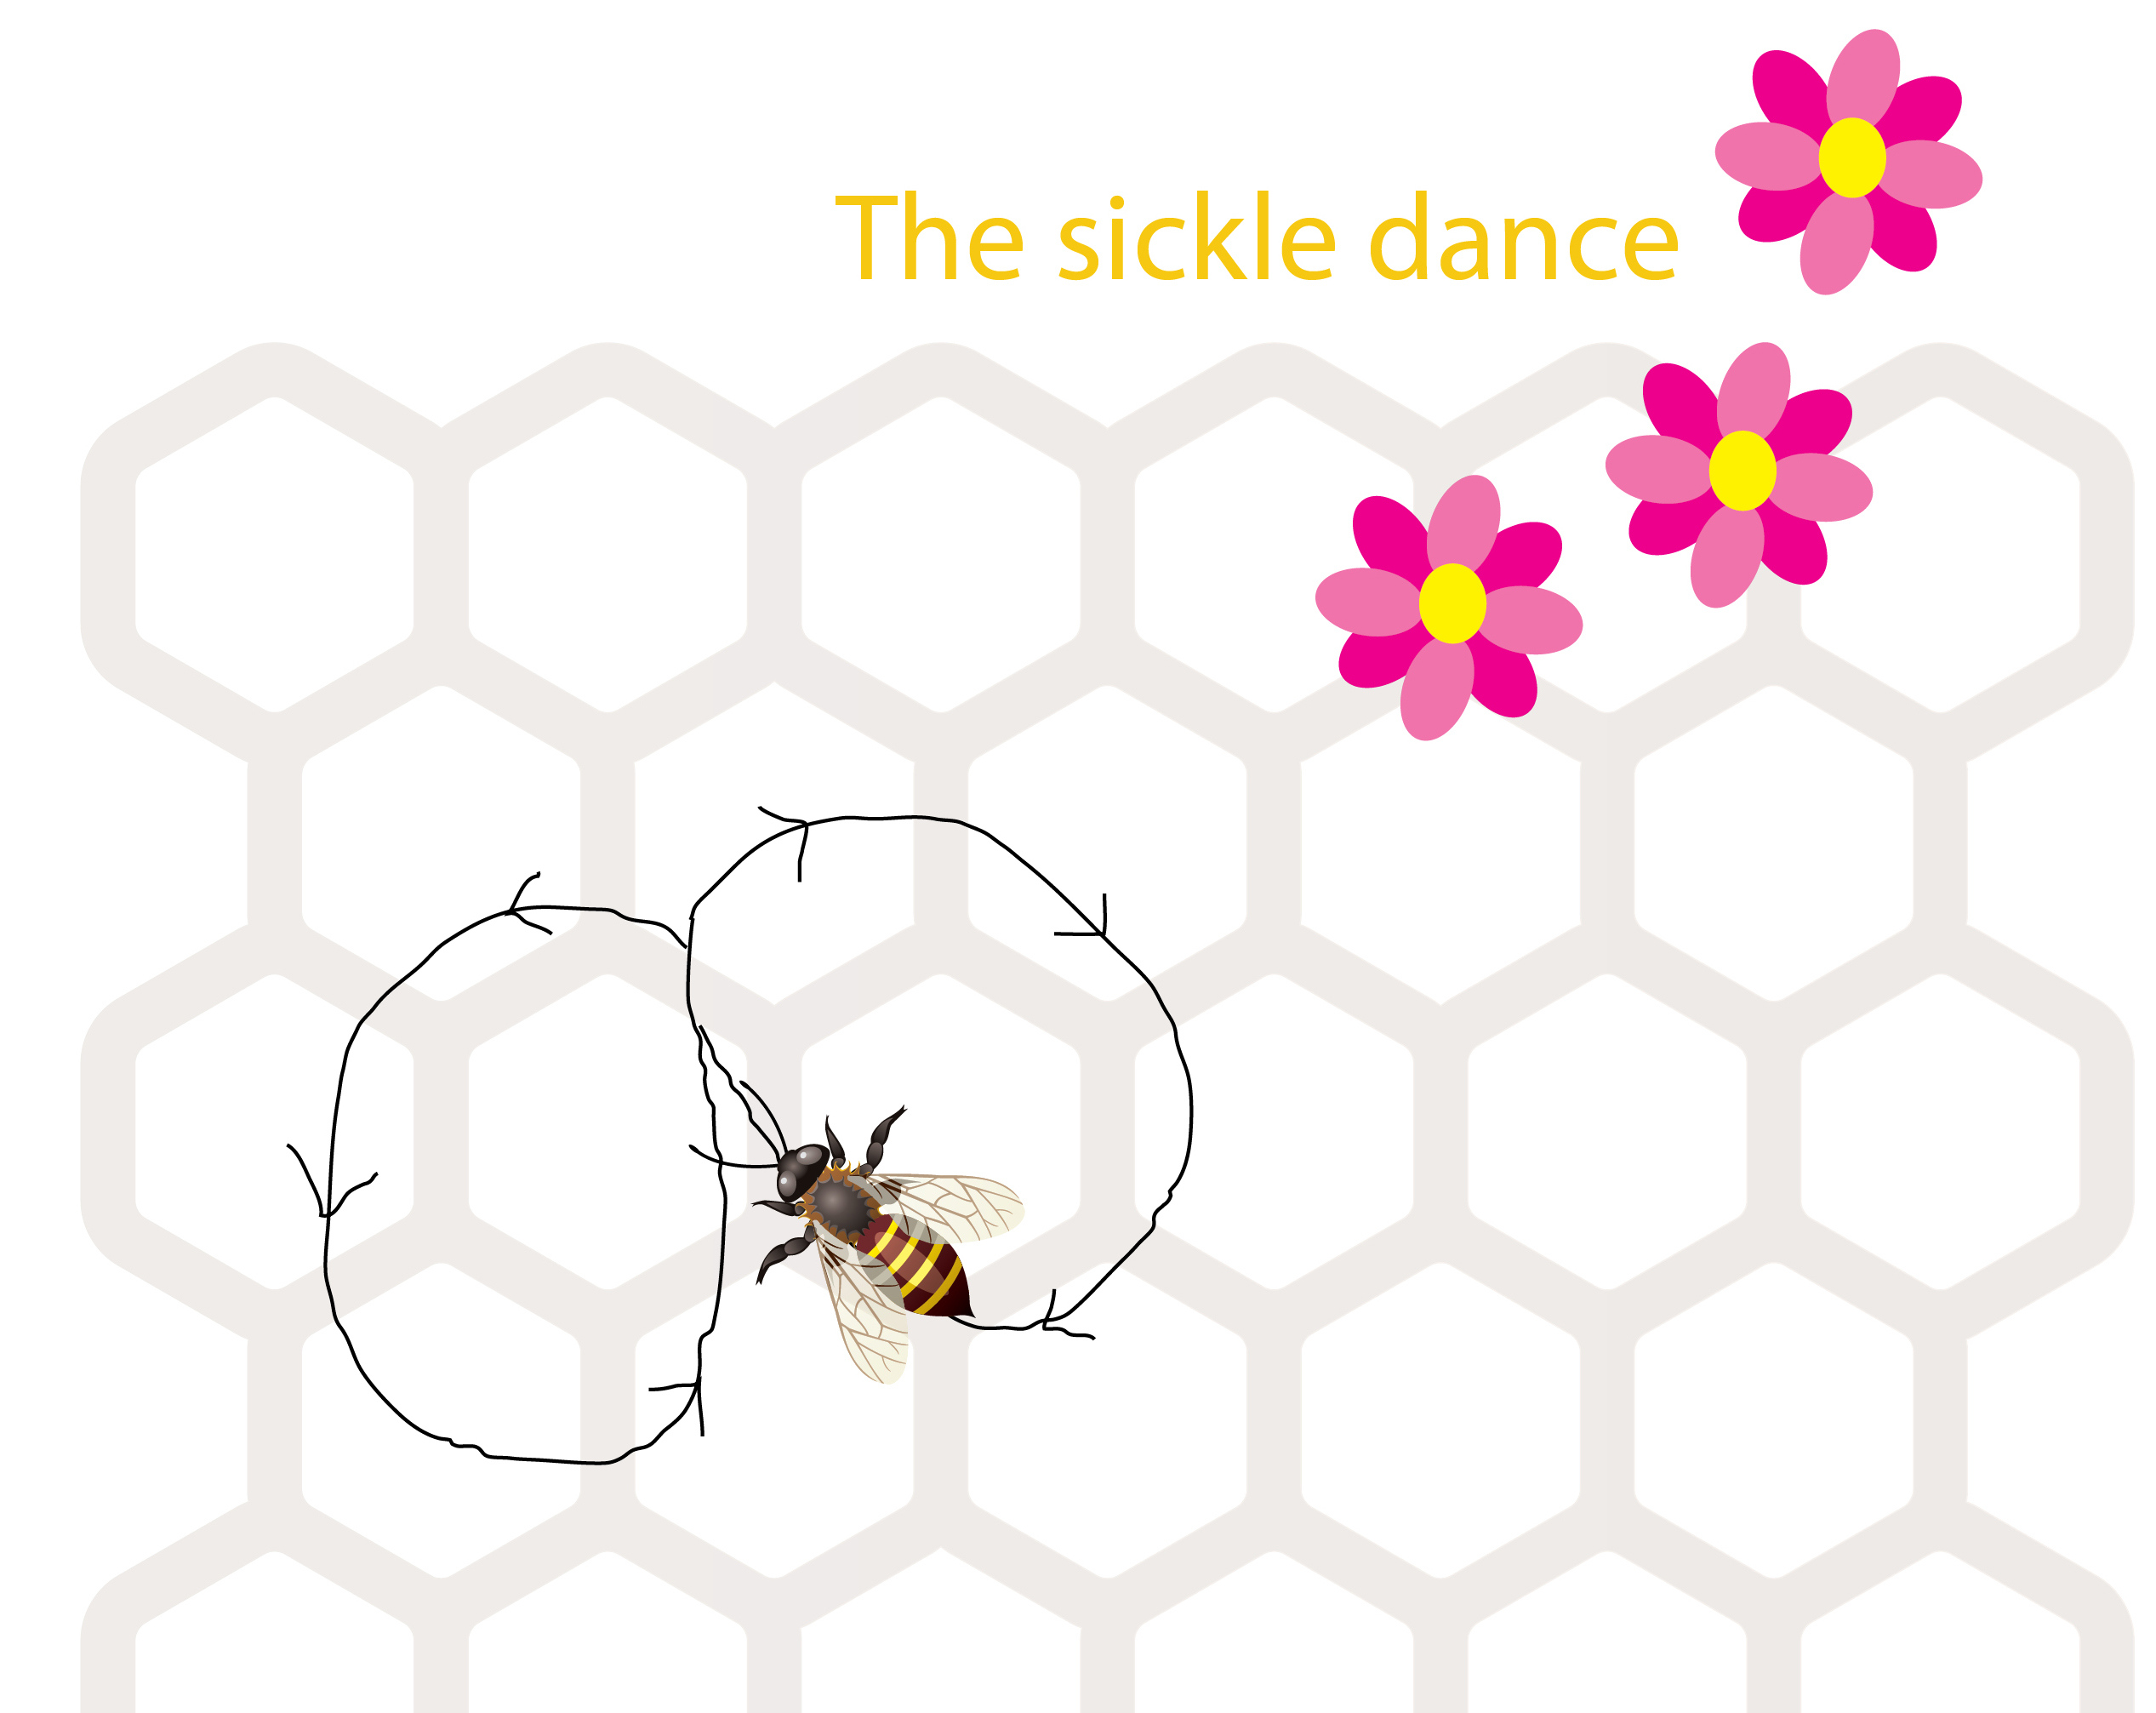 sickle dance.